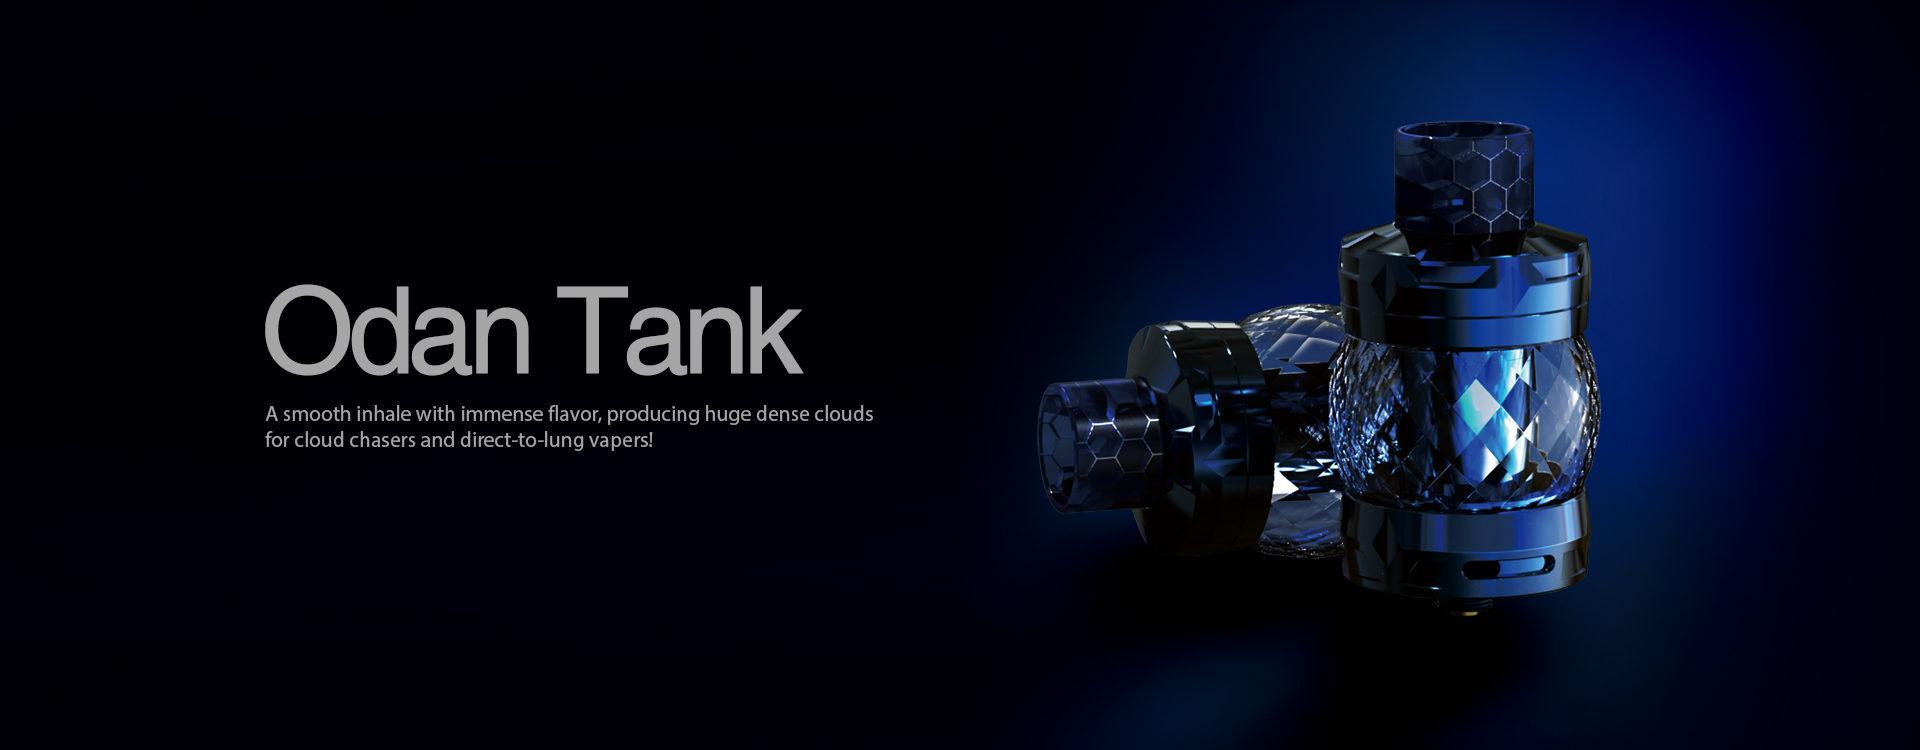 Aspire Odan Tank